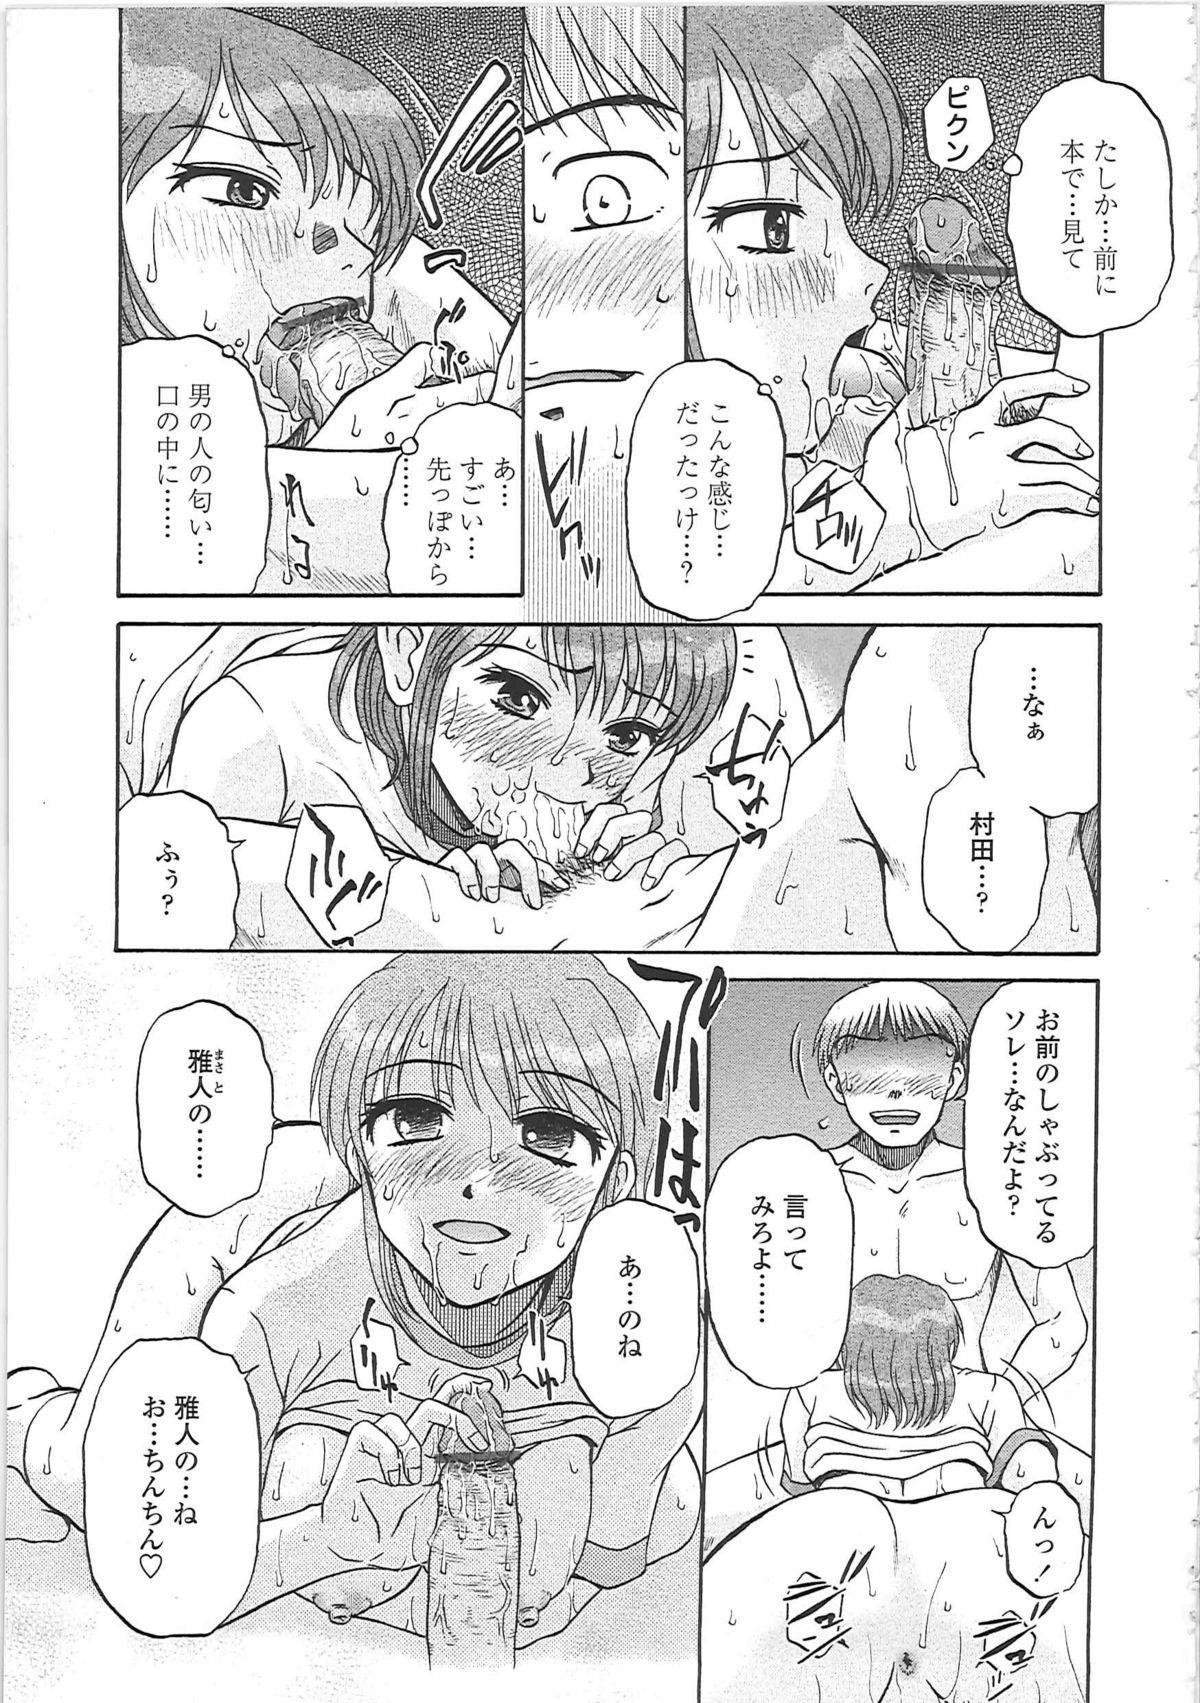 Nikuzuma Tsuushin - Erotic Wife Communication 171